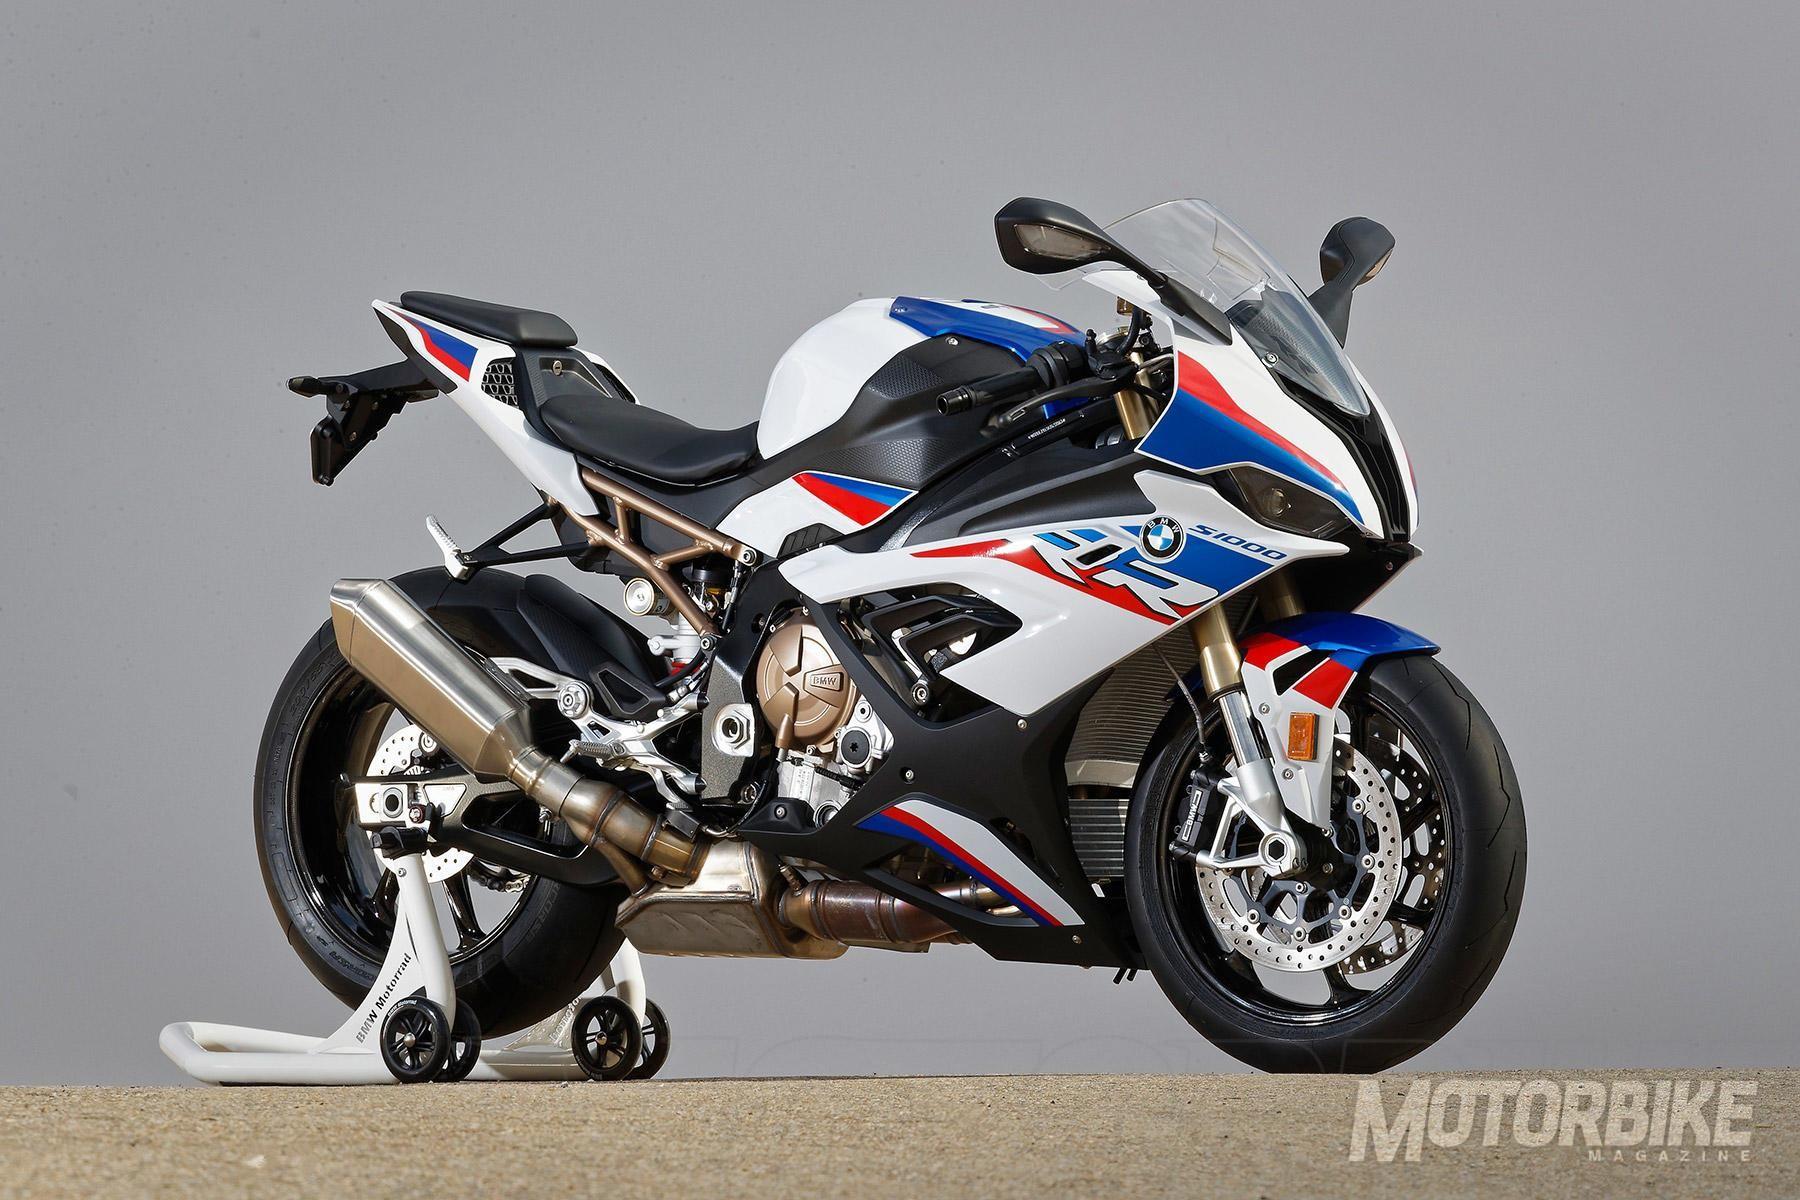 2020 BMW S1000Rr History